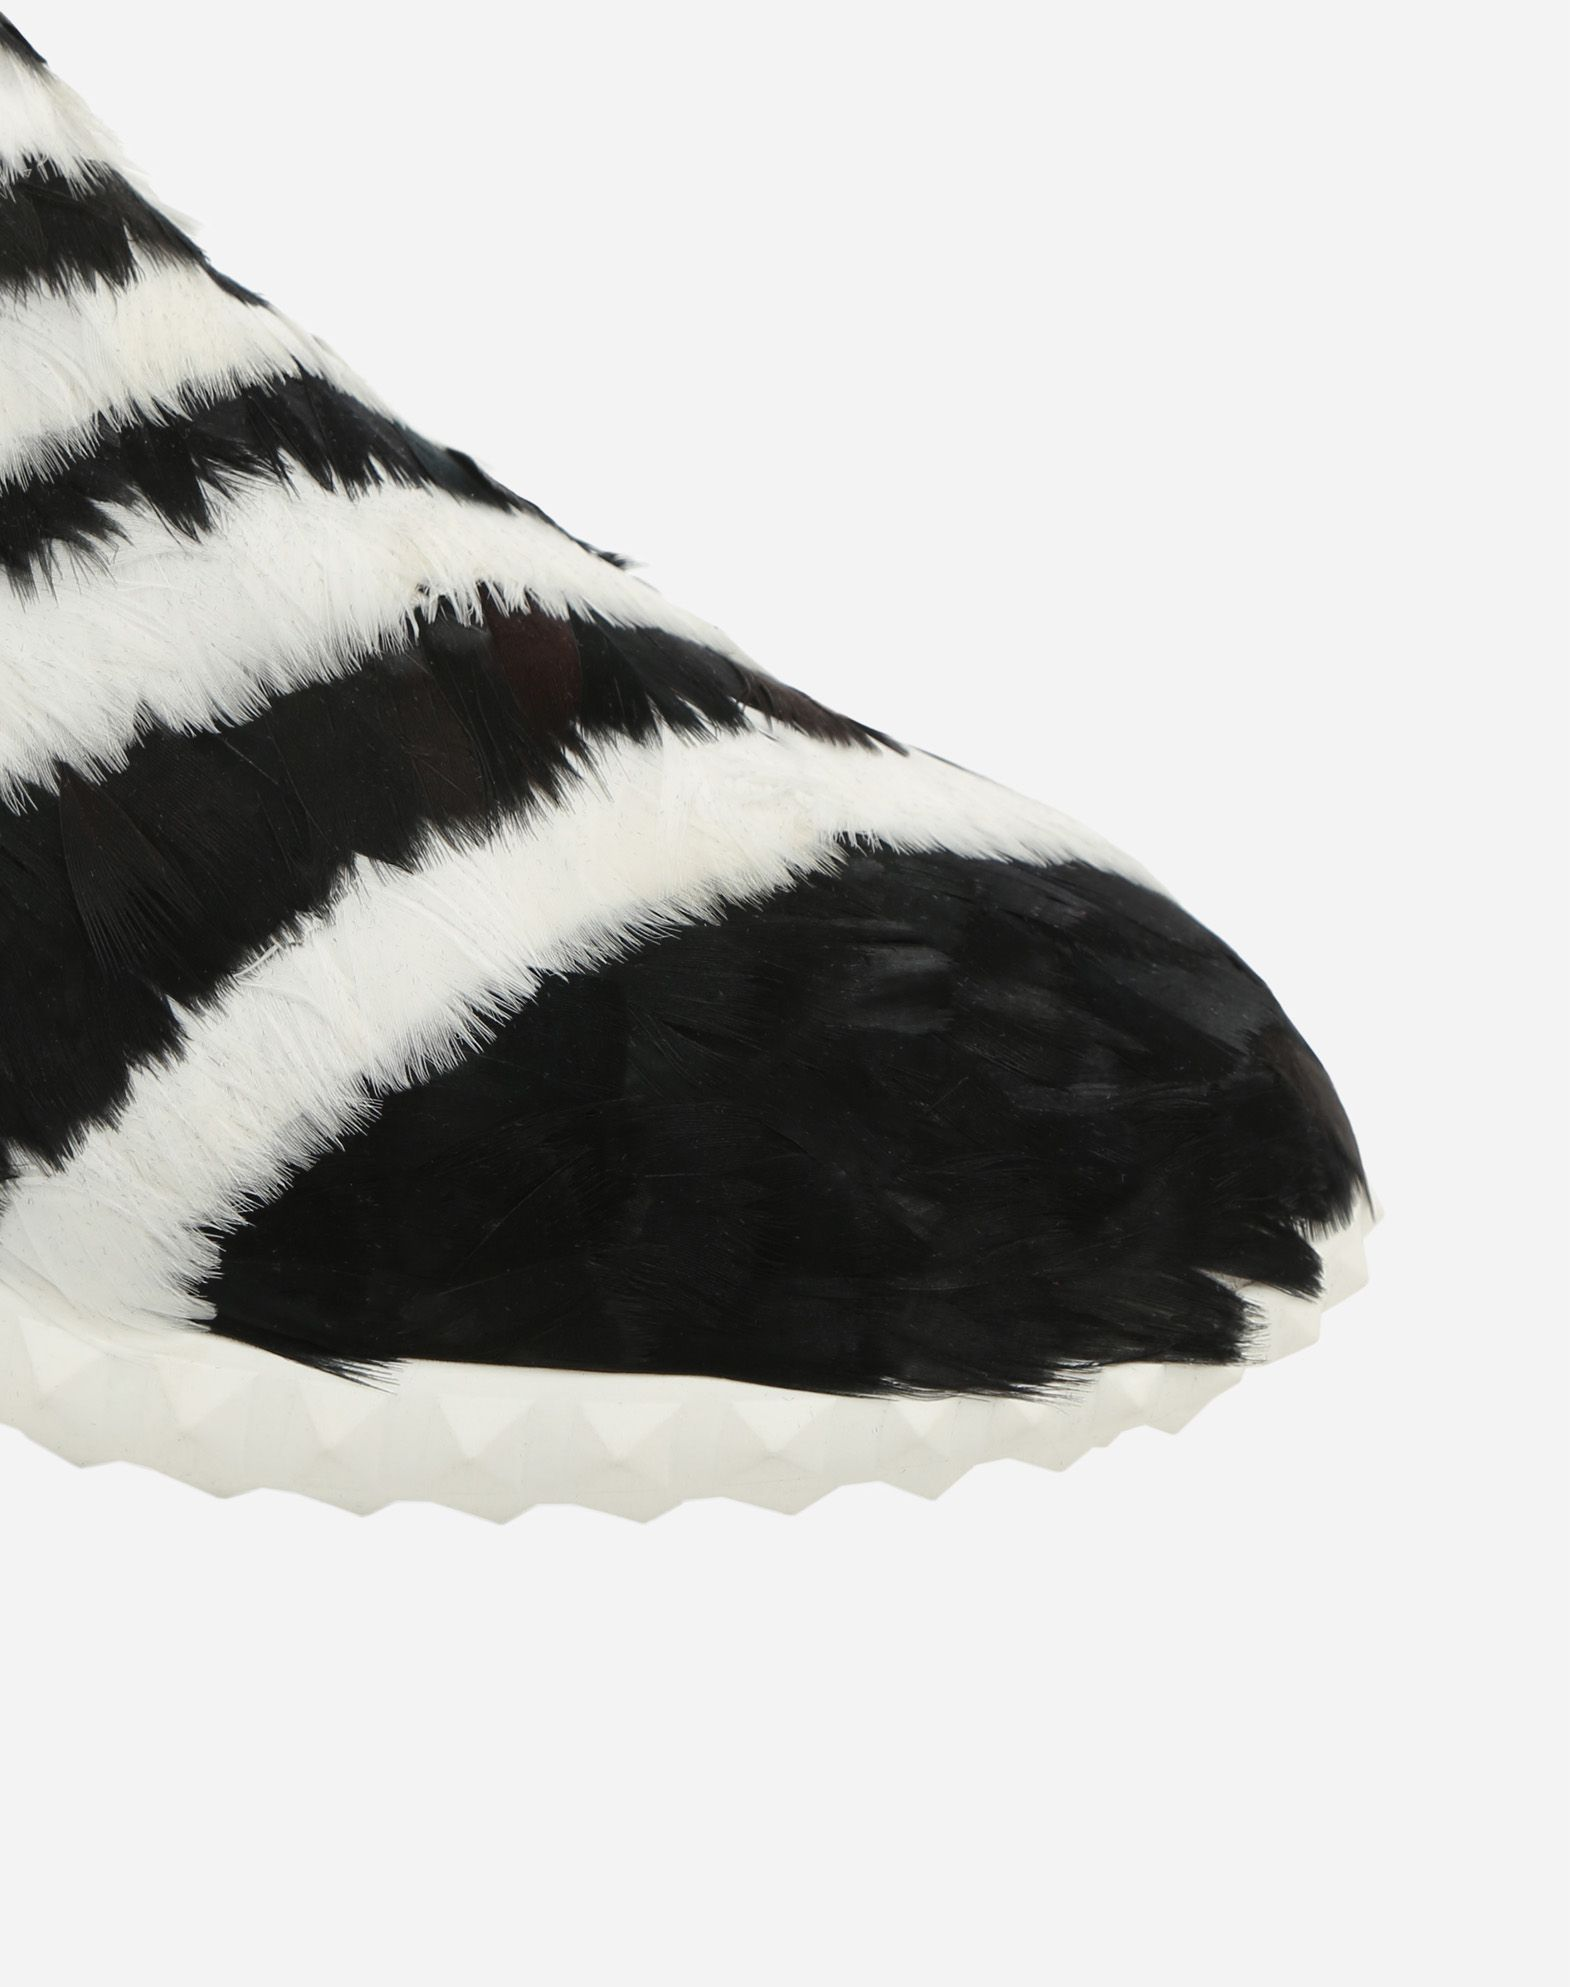 VALENTINO GARAVANI Sneakers con plumas SNEAKERS ALTAS D b